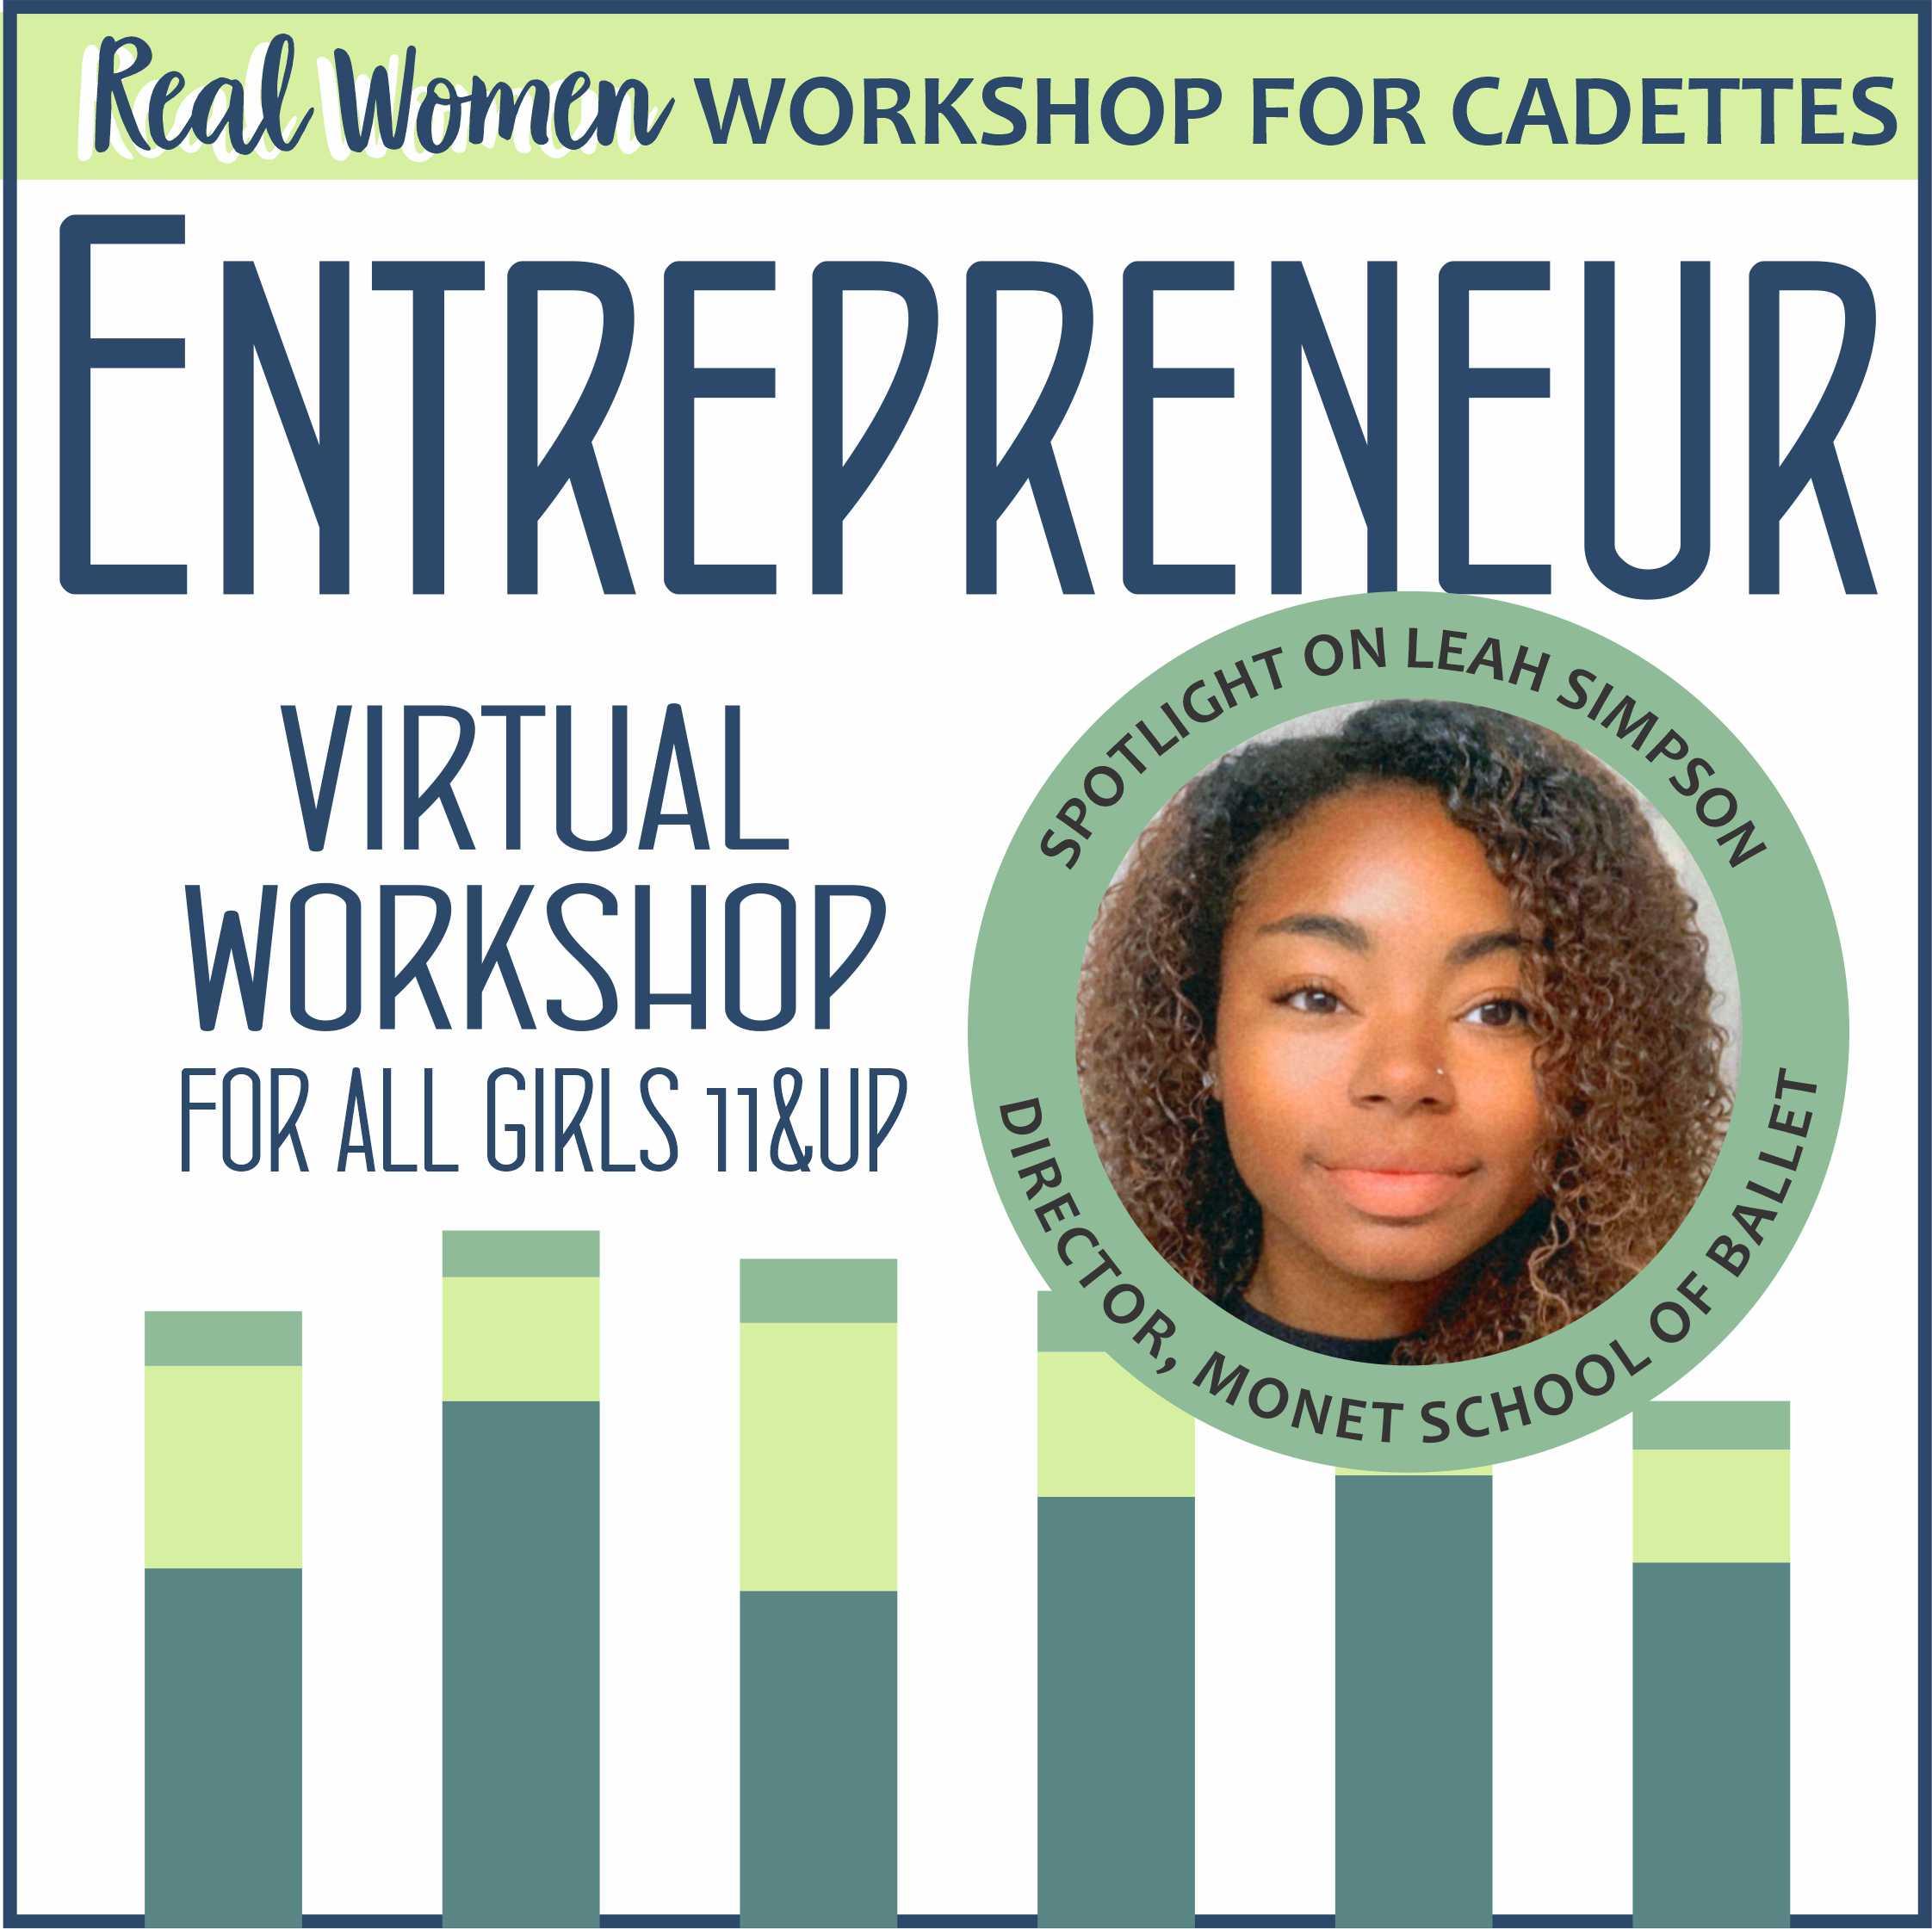 Girl Scout Entrepreneur Real Woman Virtual Workshop for Cadettes